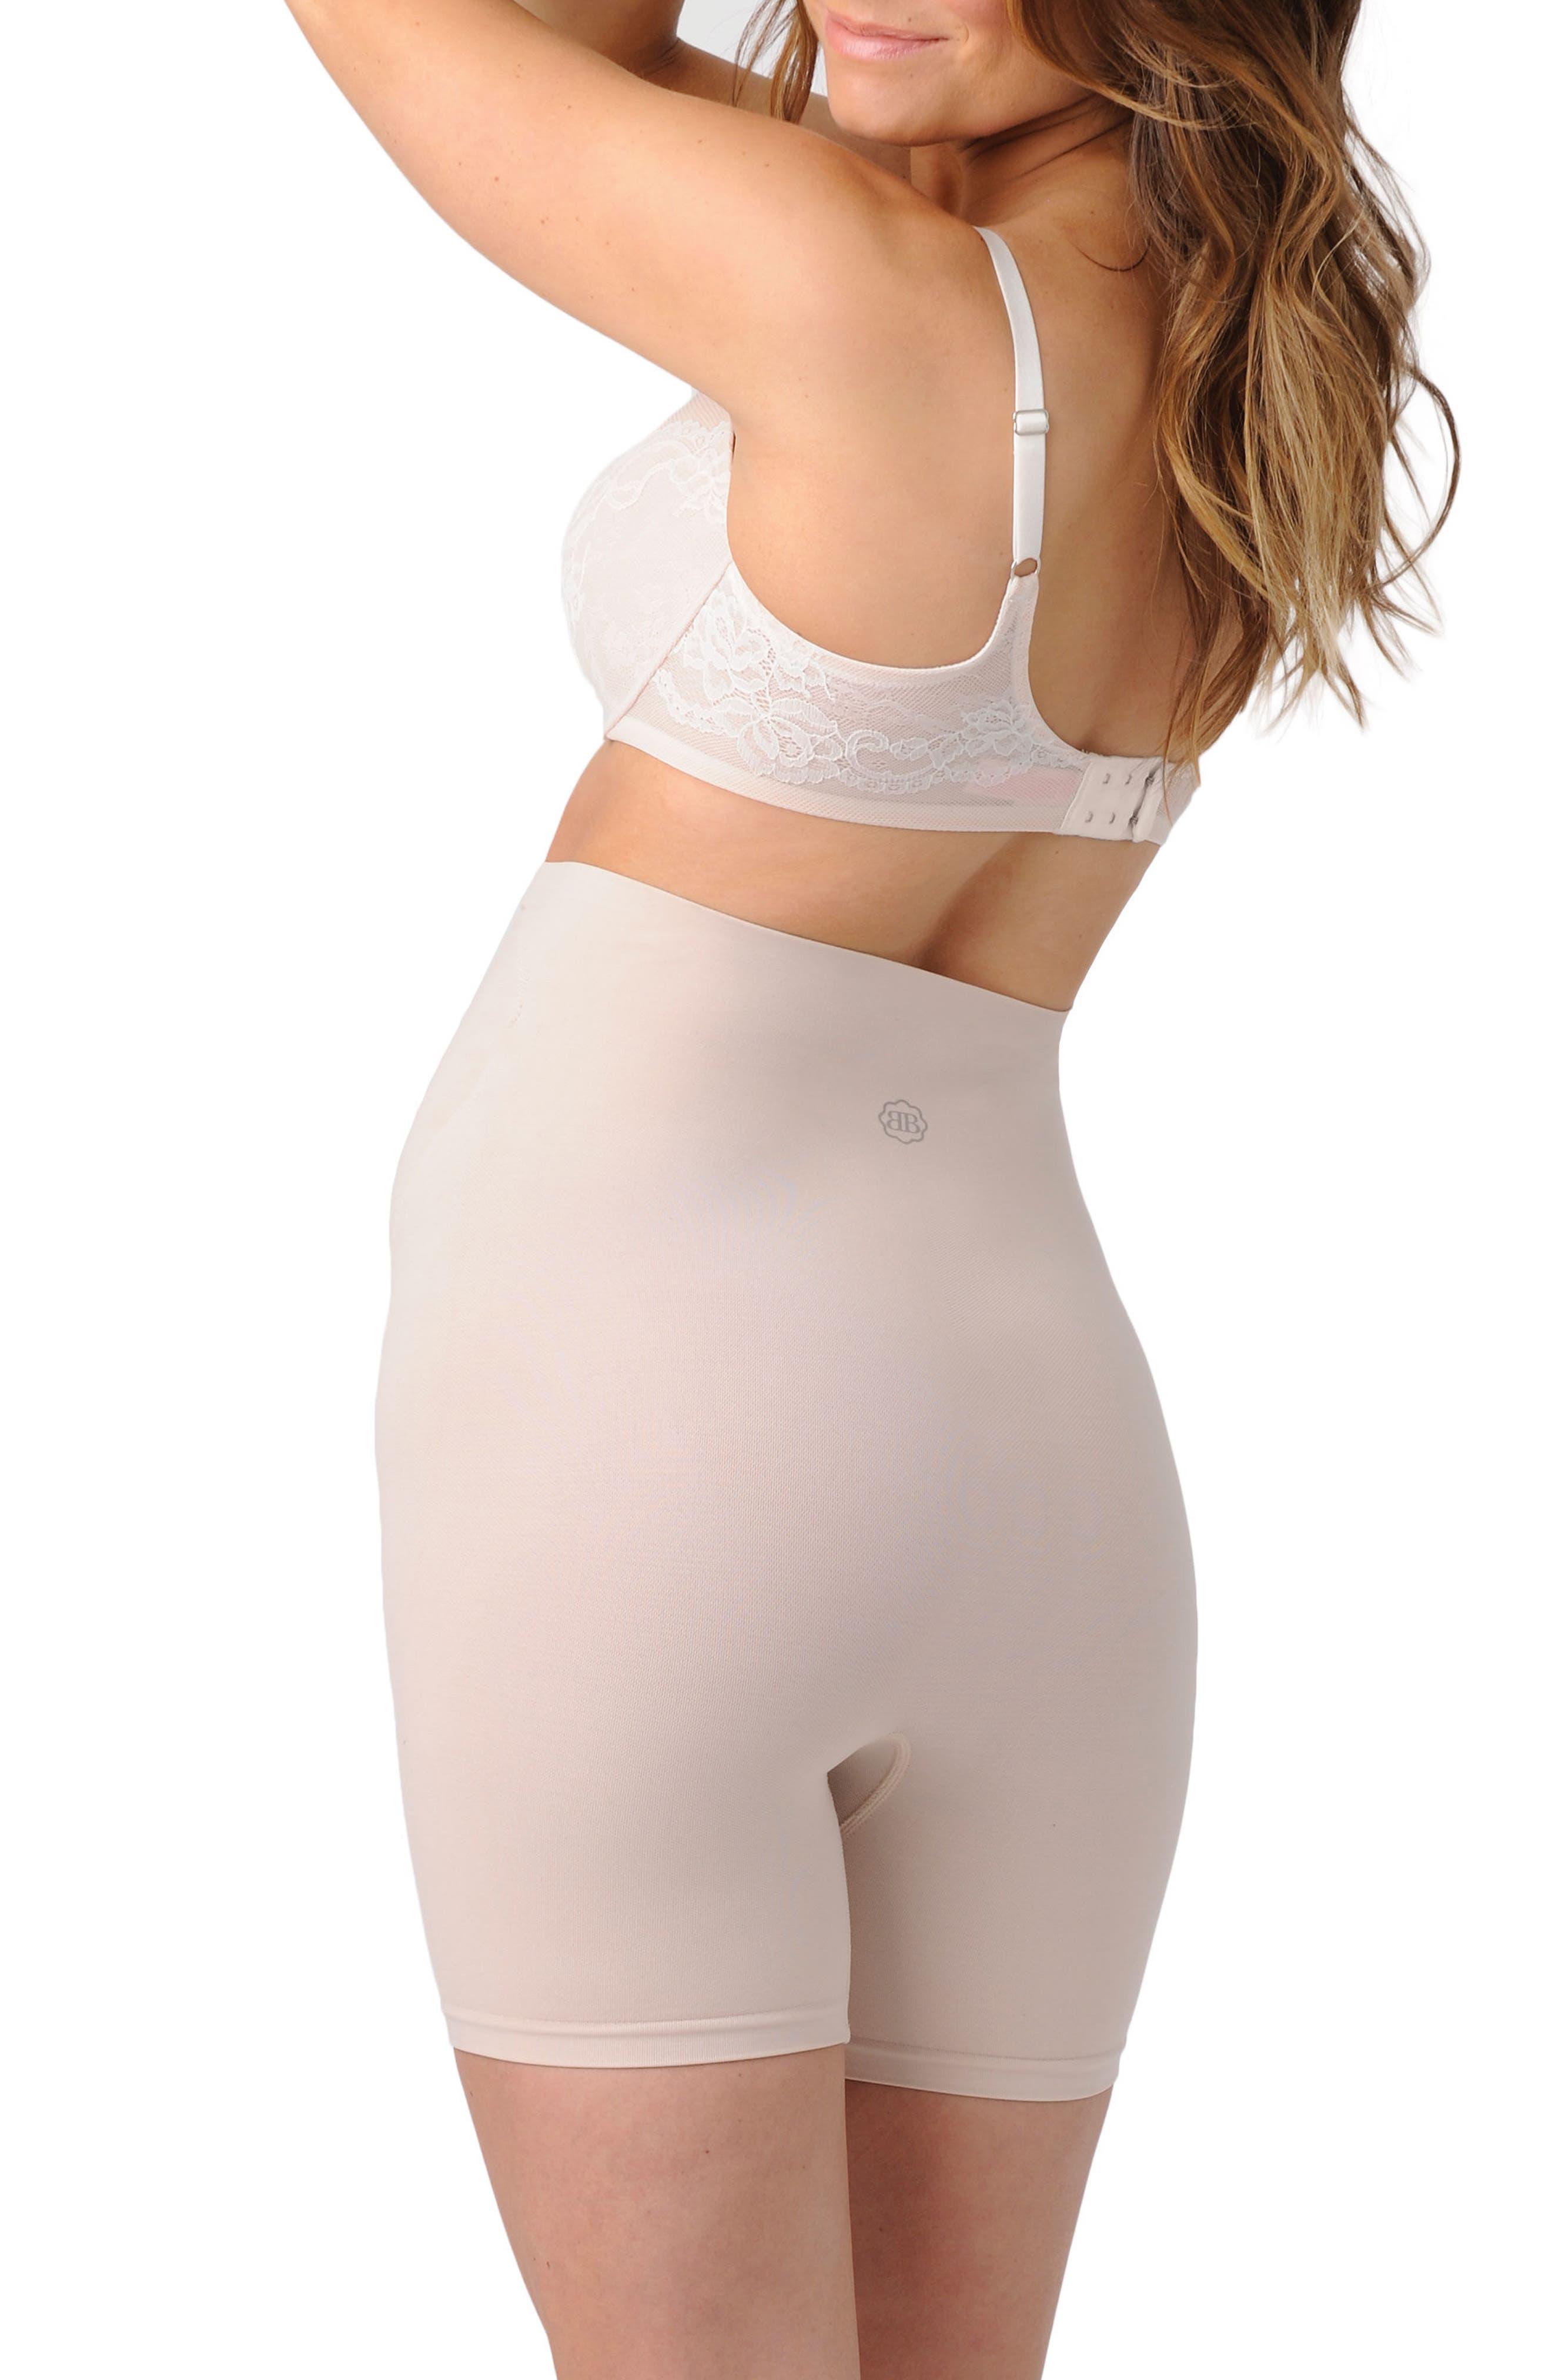 Alternate Image 2  - Belly Bandit® Belly Boost™ Wrap & Support Shorts 2-Pack Bundle